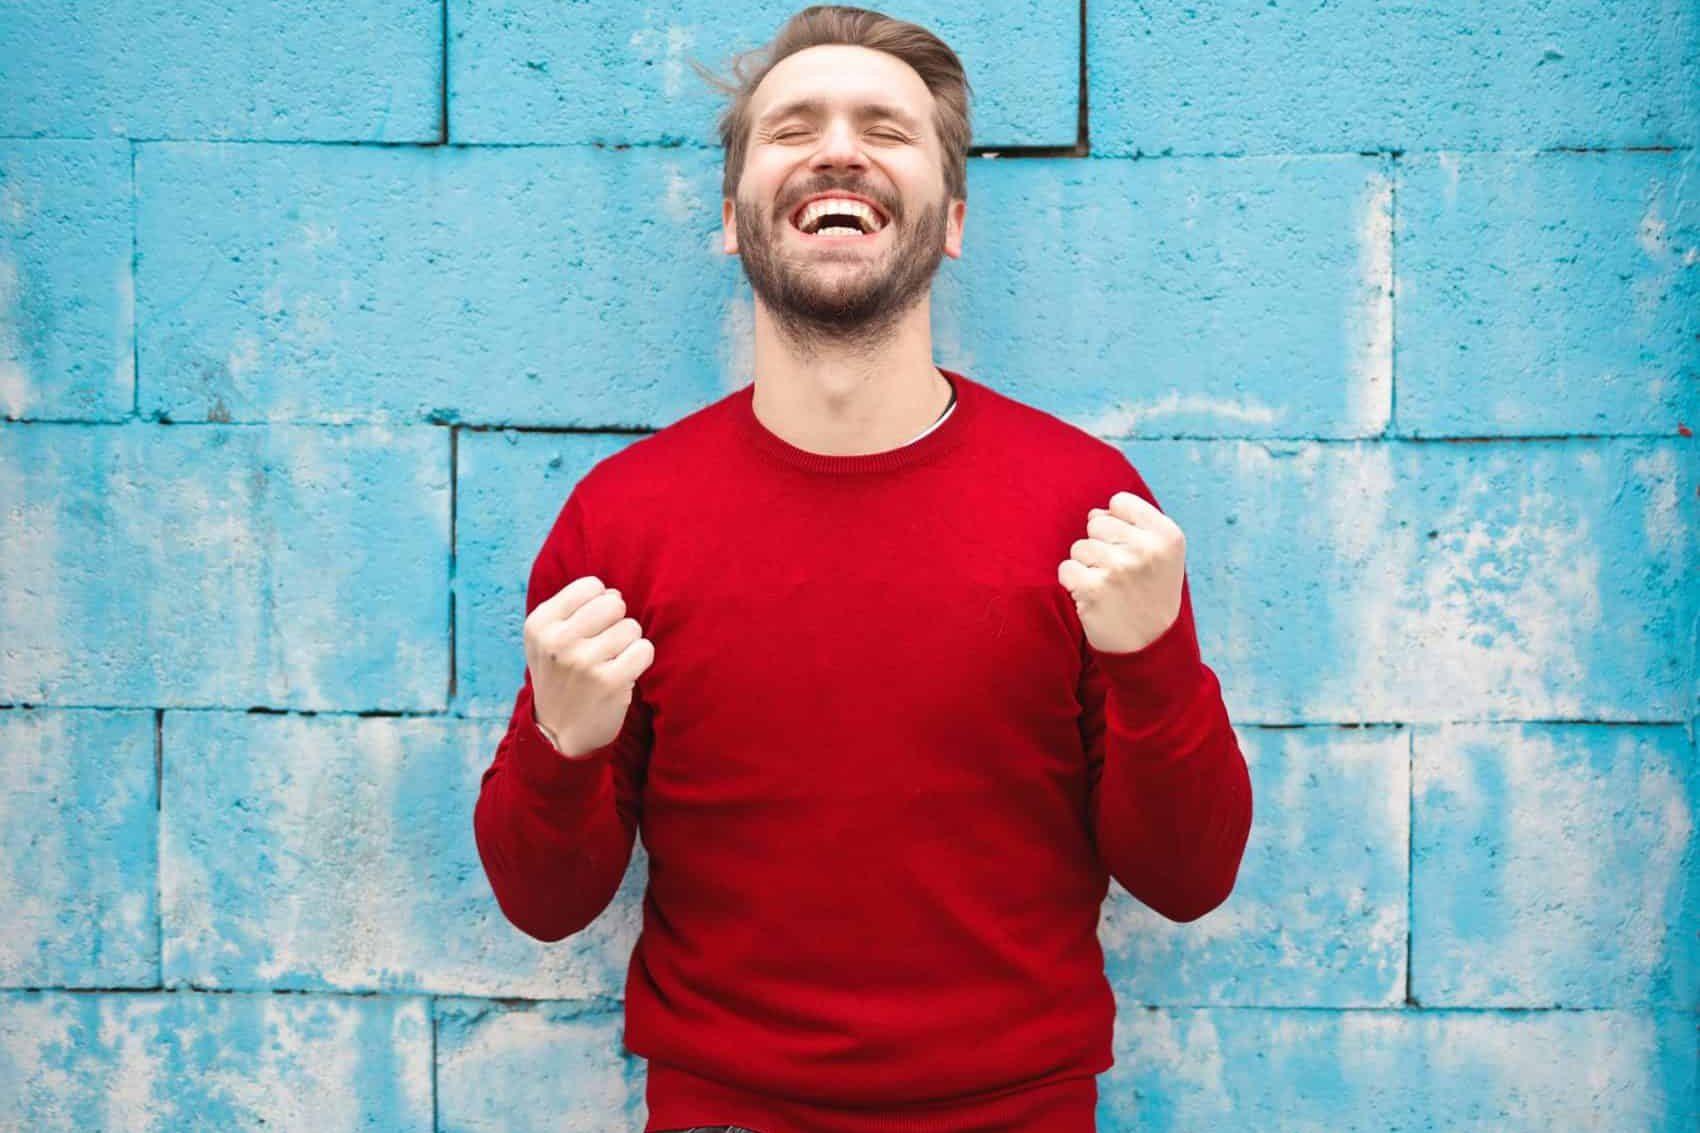 man-in-red-crew-neck-sweatshirt-photography-941693